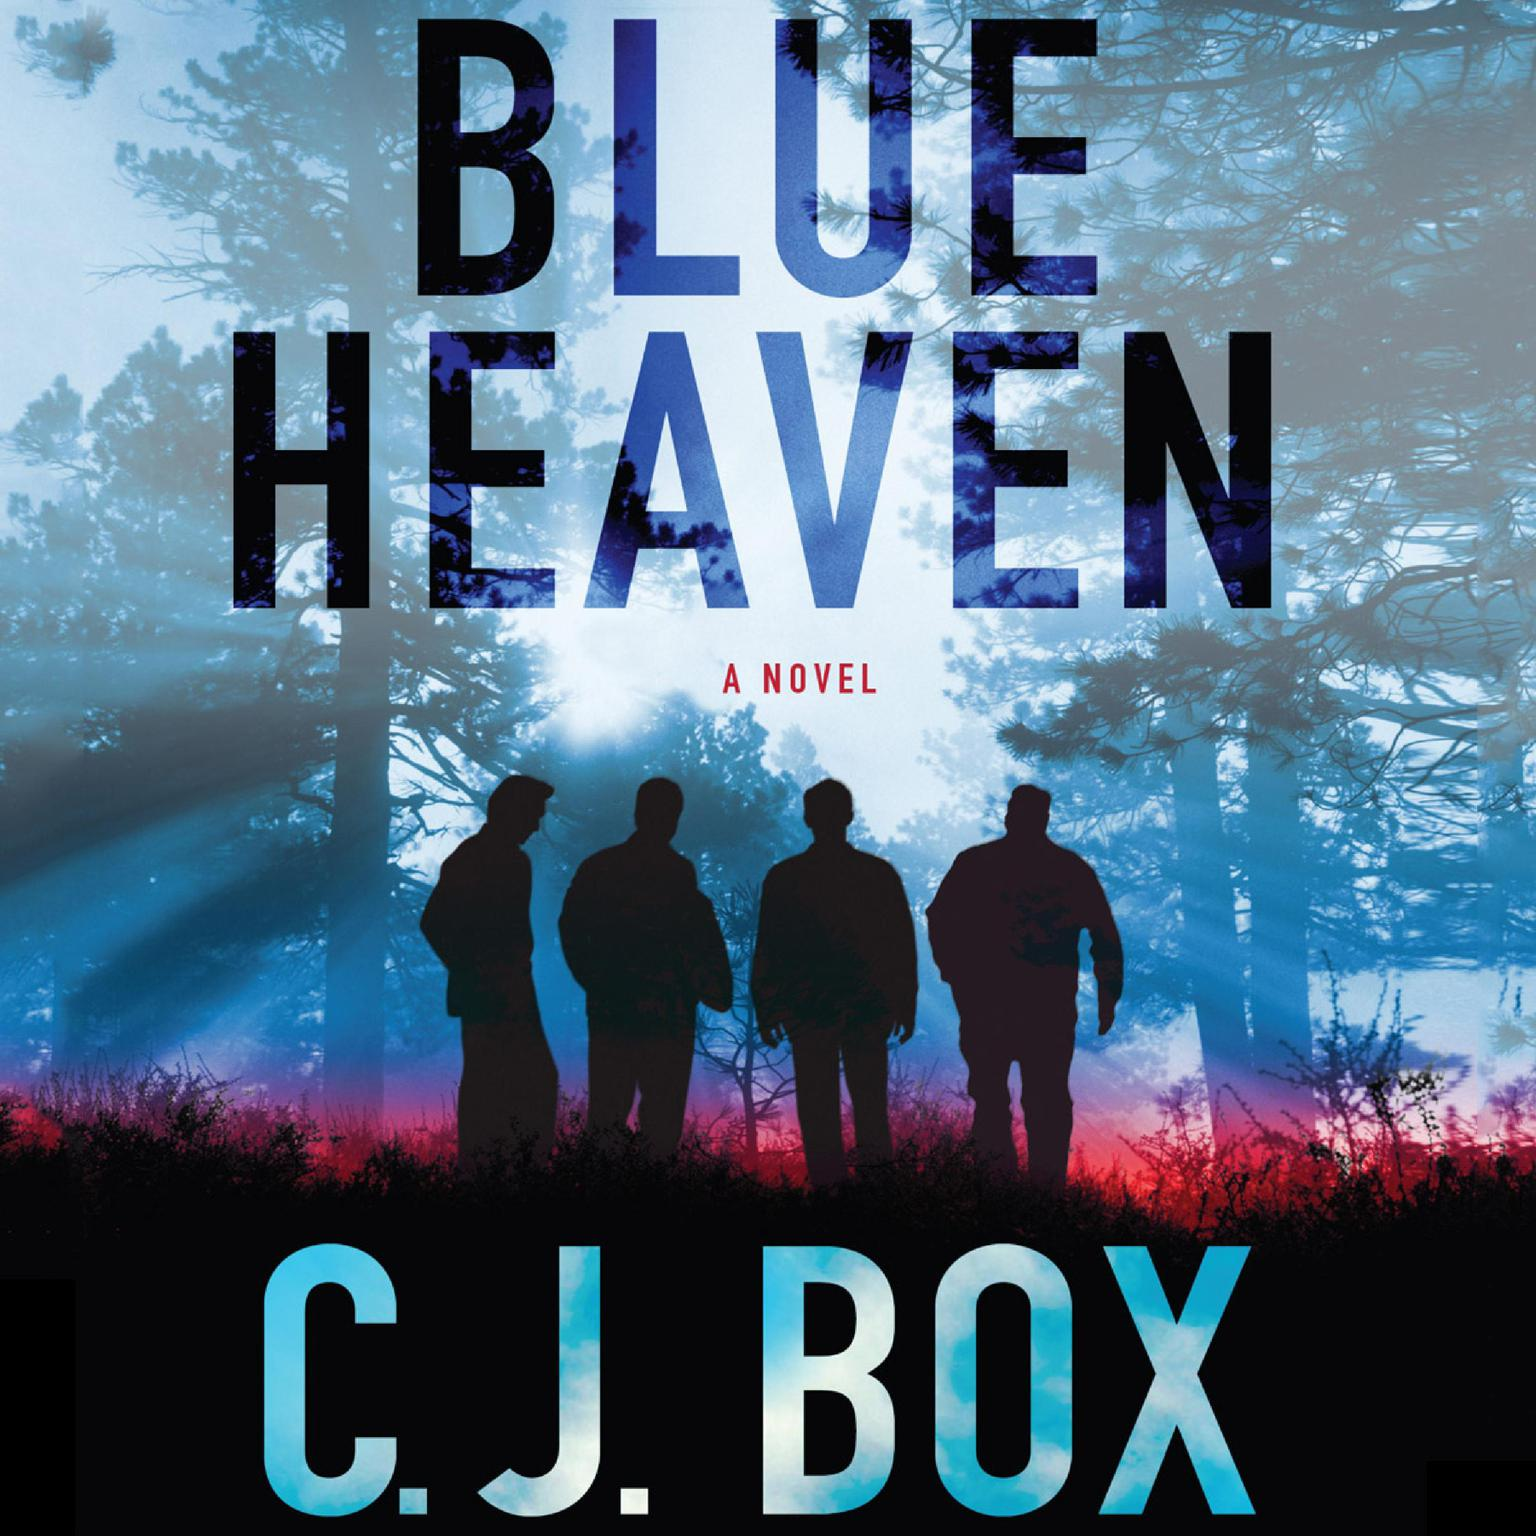 Blue Heaven: A Novel Audiobook, by C. J. Box